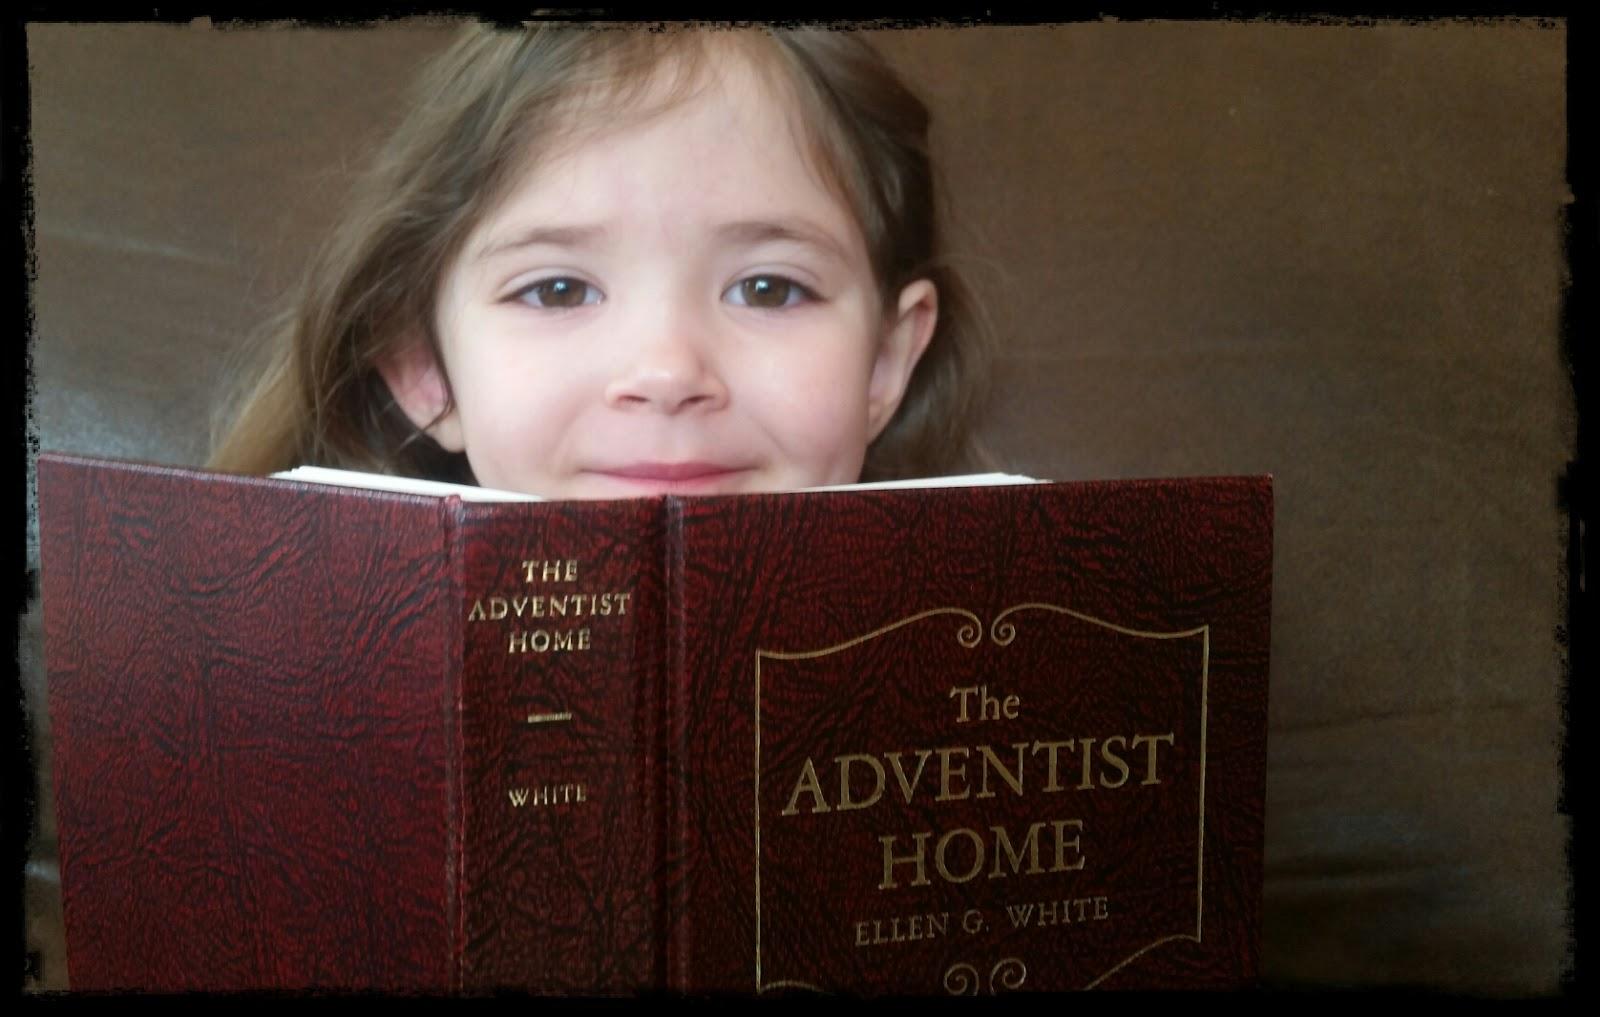 Adventist Home Book